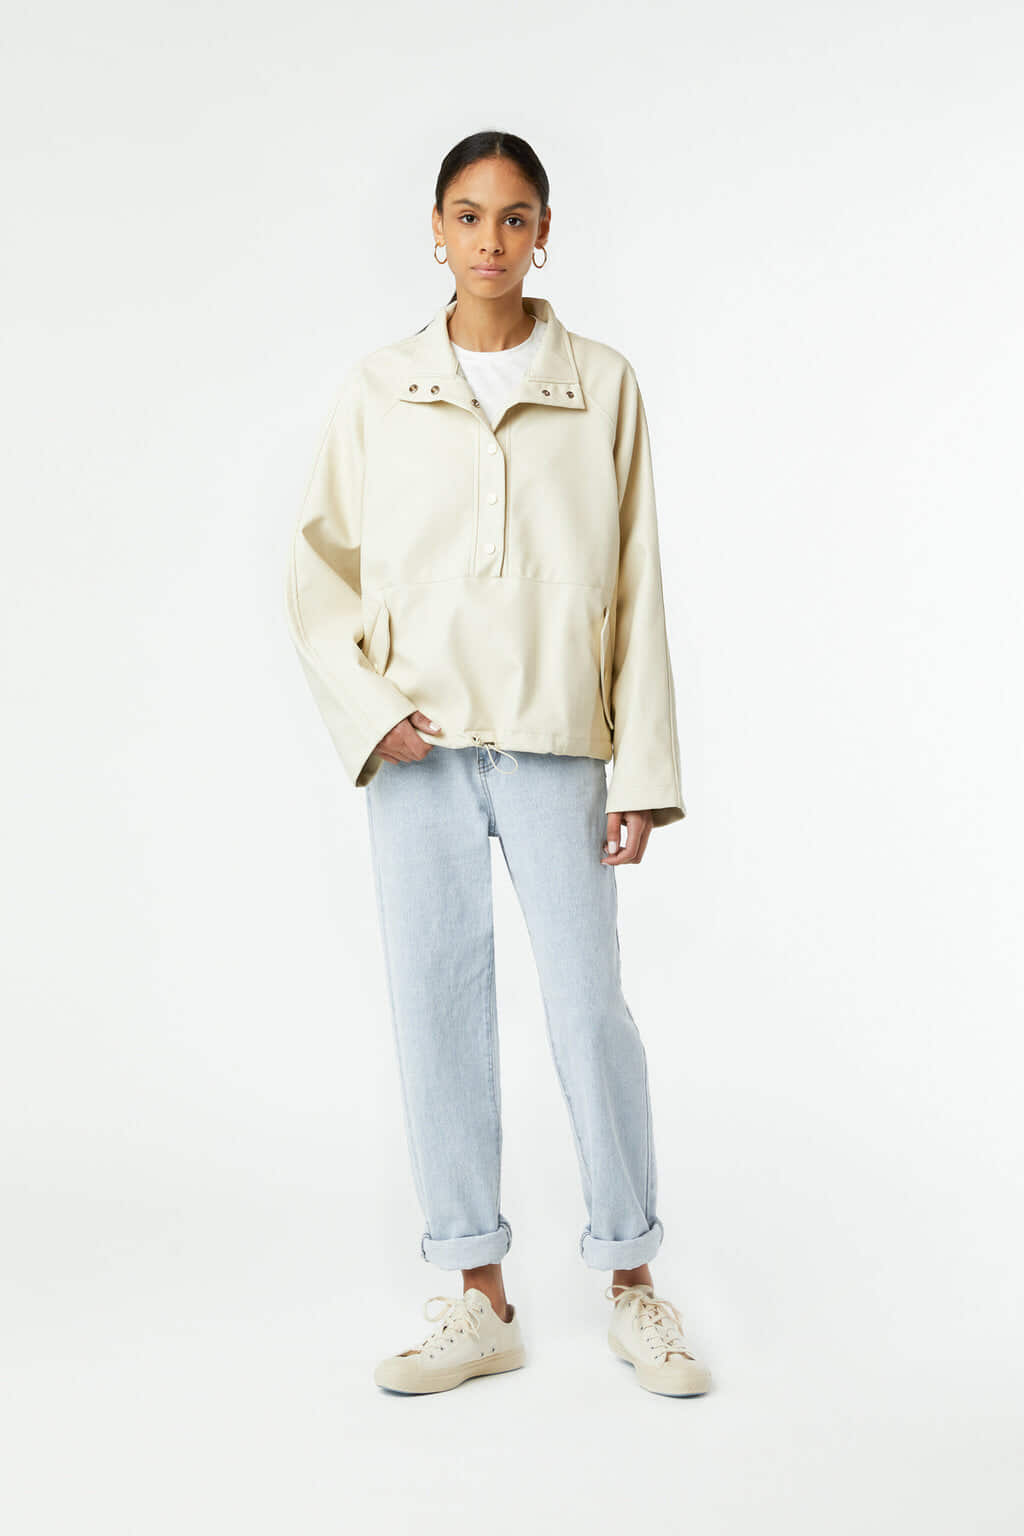 Jacket K001 Cream 3